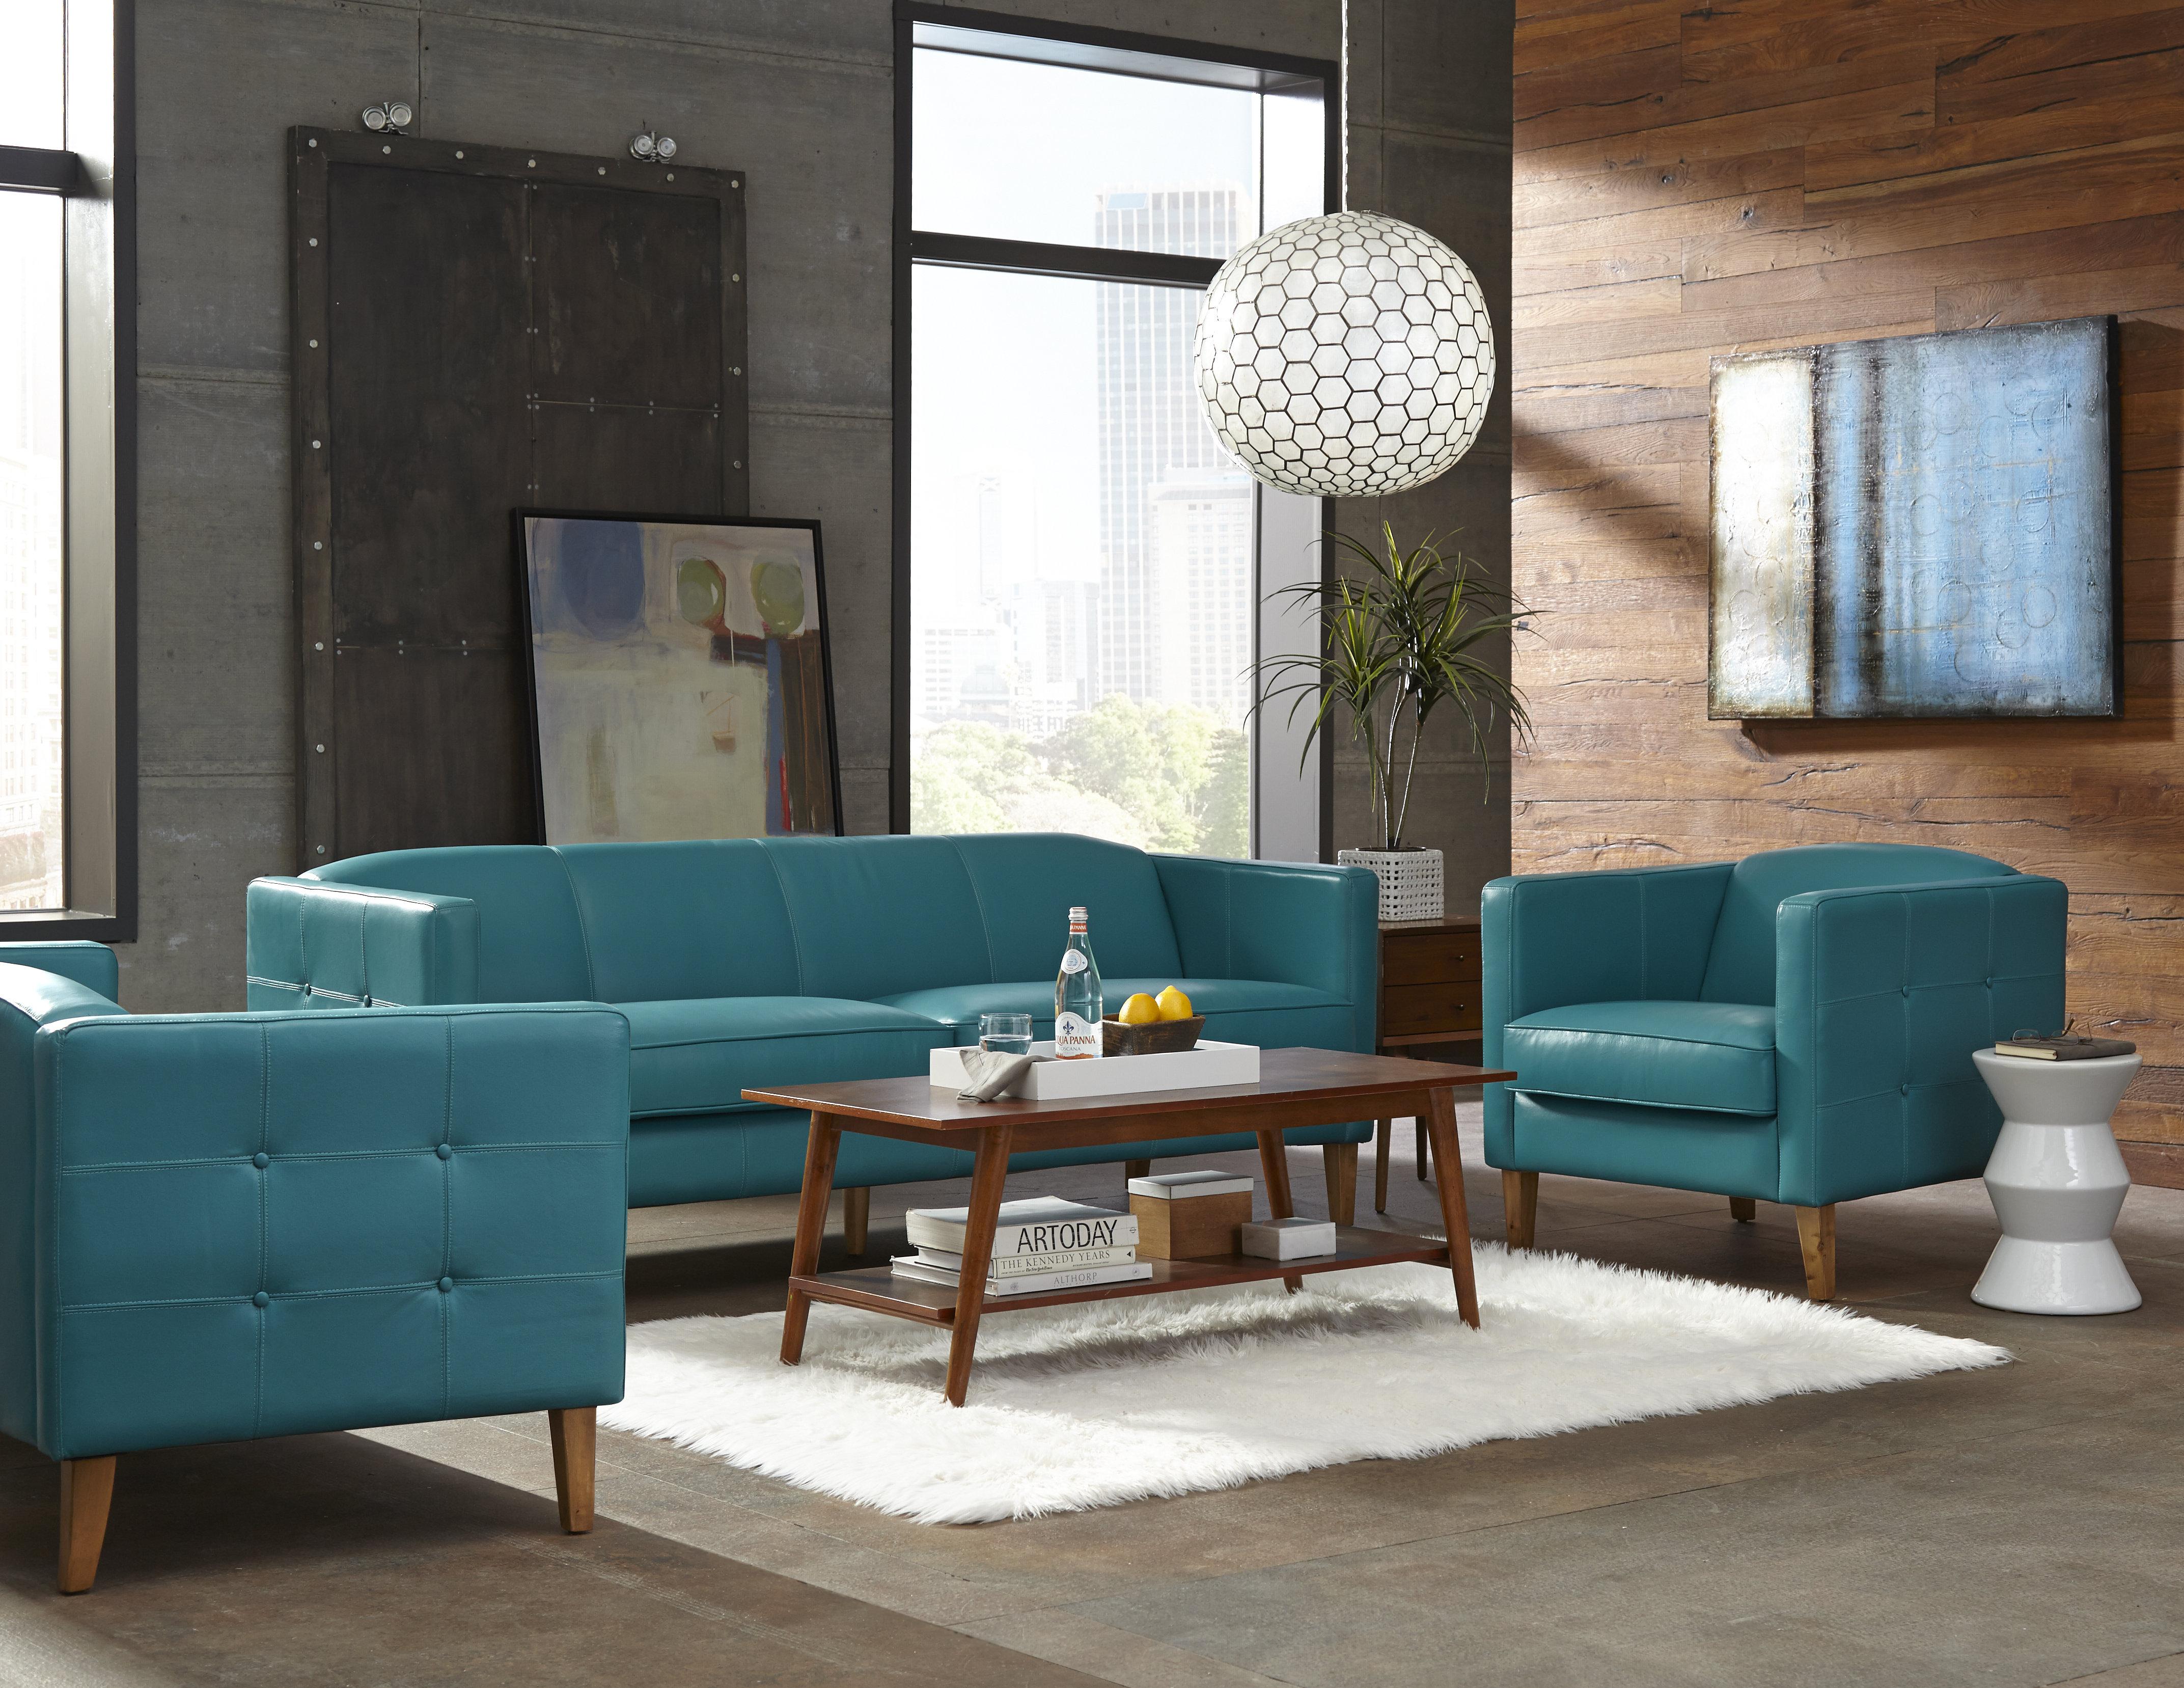 lazzaro leather miami configurable living room set reviews wayfair rh wayfair com living room furniture made in nairobi living room furniture made in wales